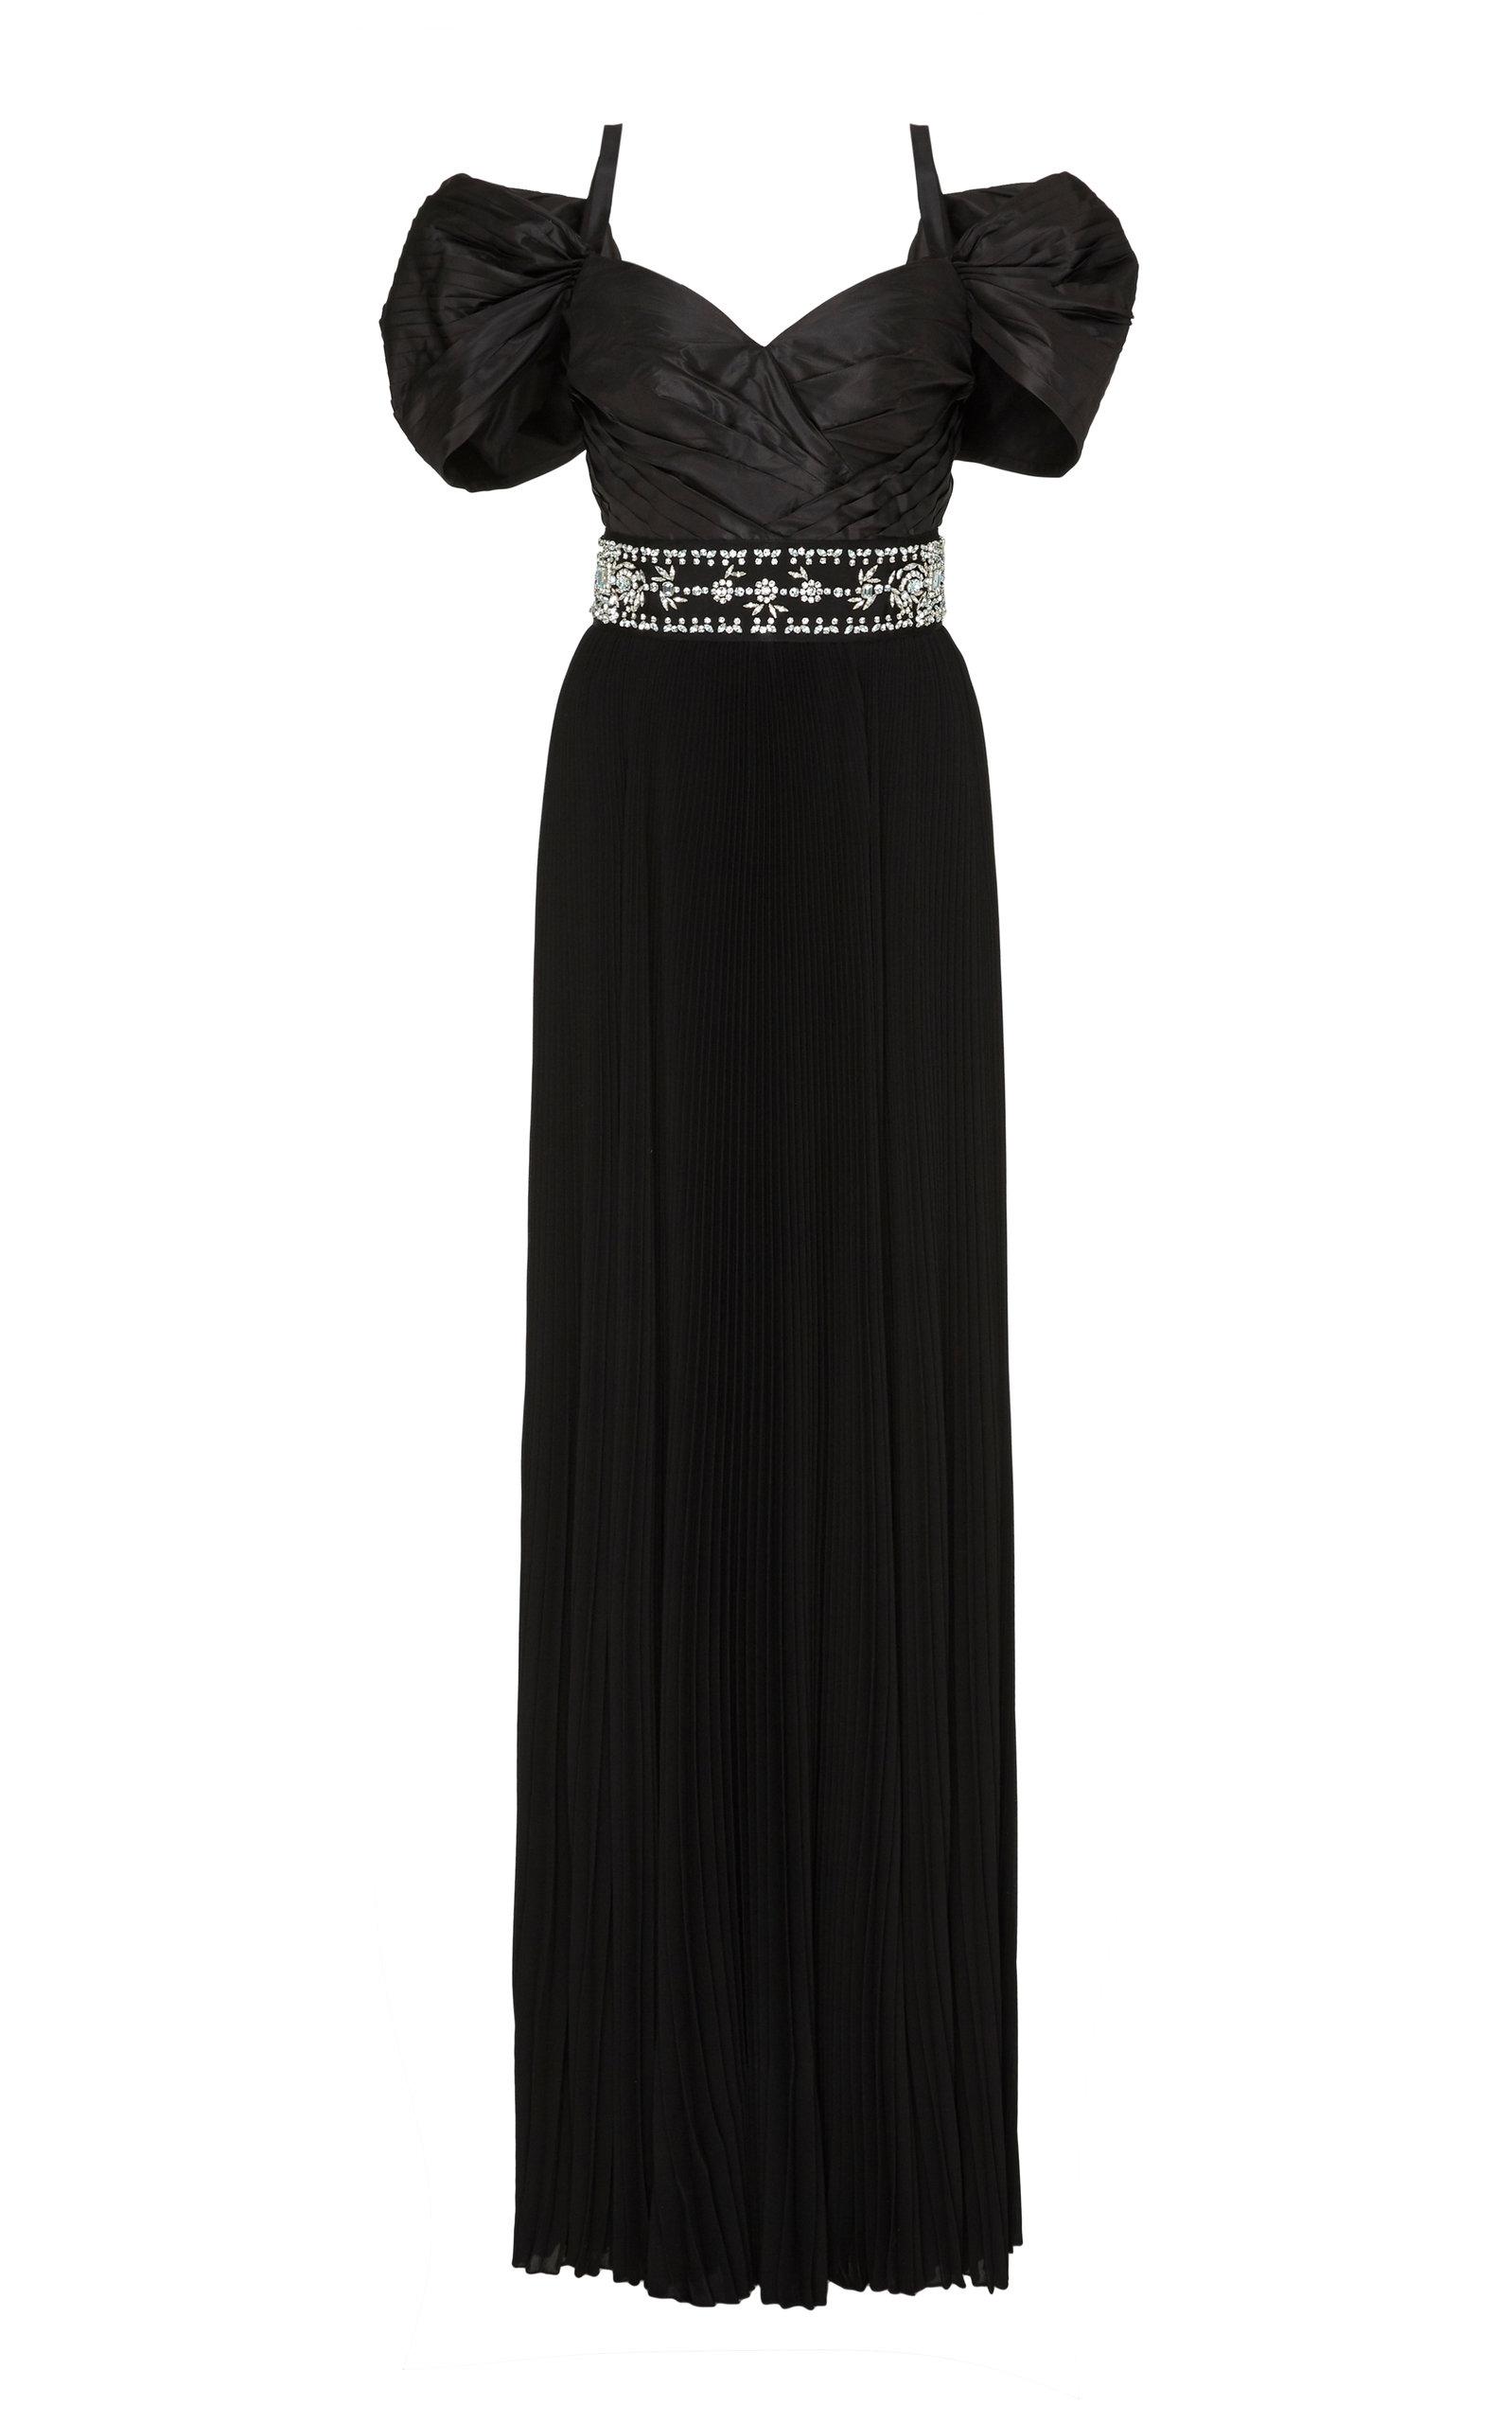 Buy Prada Crystal-Embellished Taffeta Gown online, shop Prada at the best price